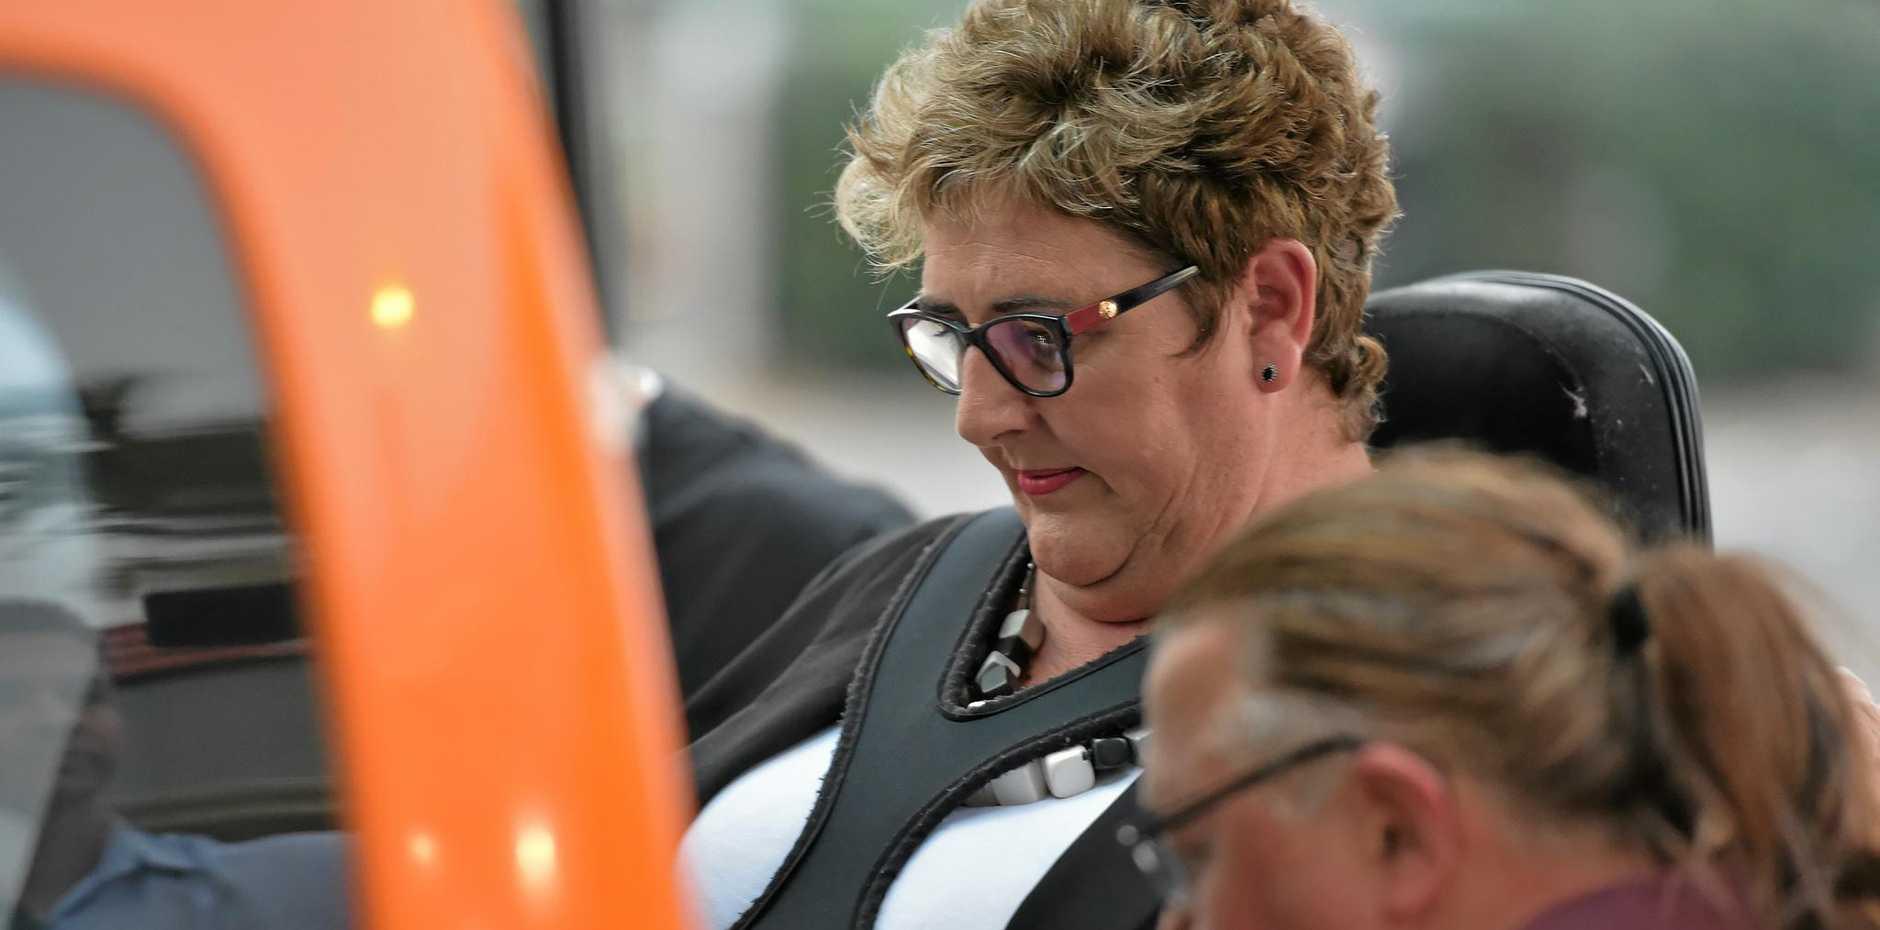 BE Lifestyle managing director Belinda Wardlaw leaves Maroochydore Court House.